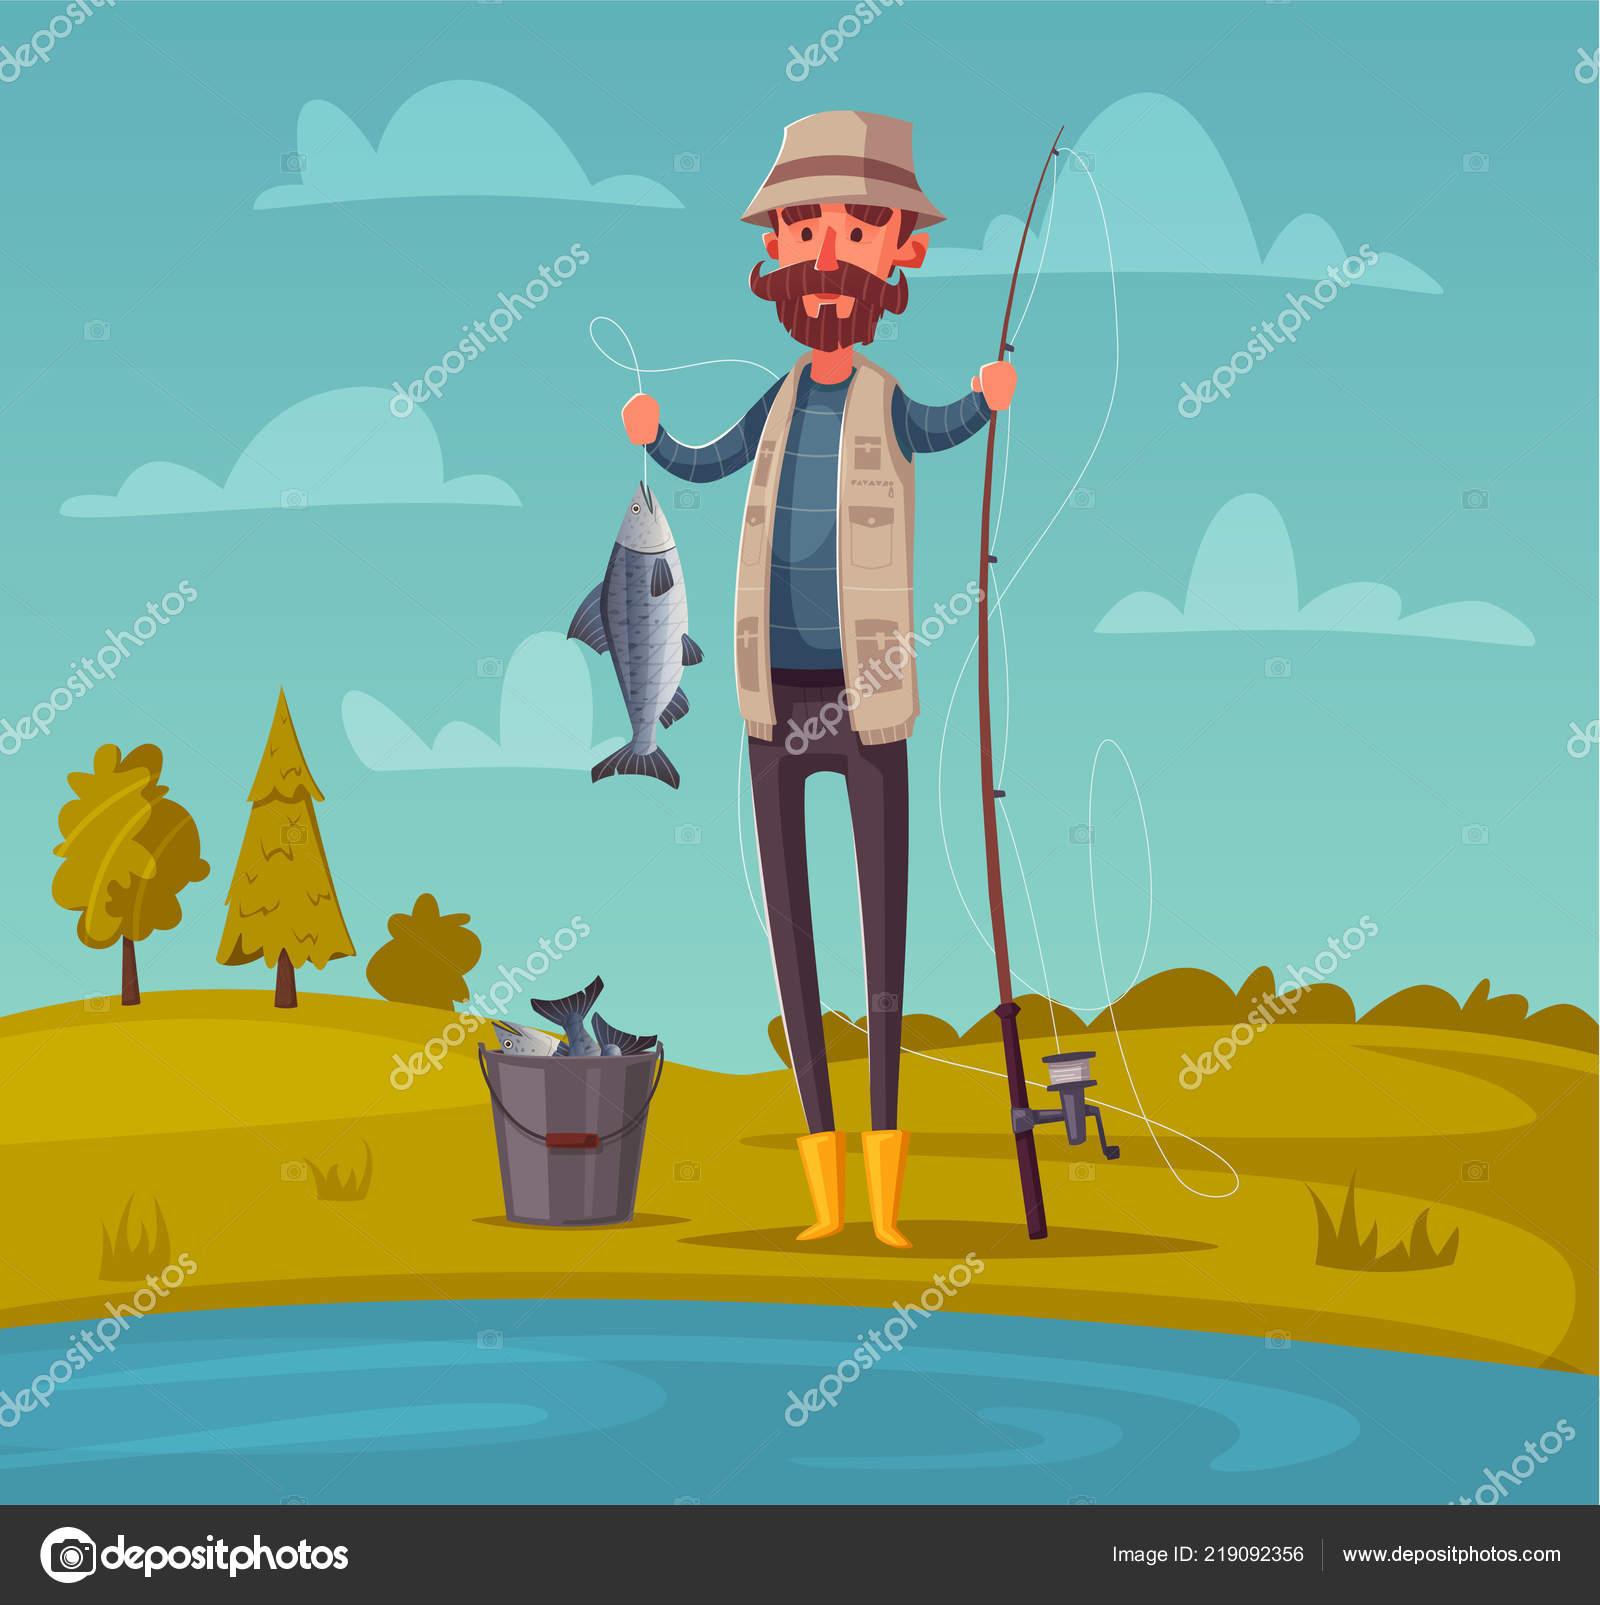 Rybar S Rybarsky Prut Kreslene Vektorove Ilustrace Stock Vektor